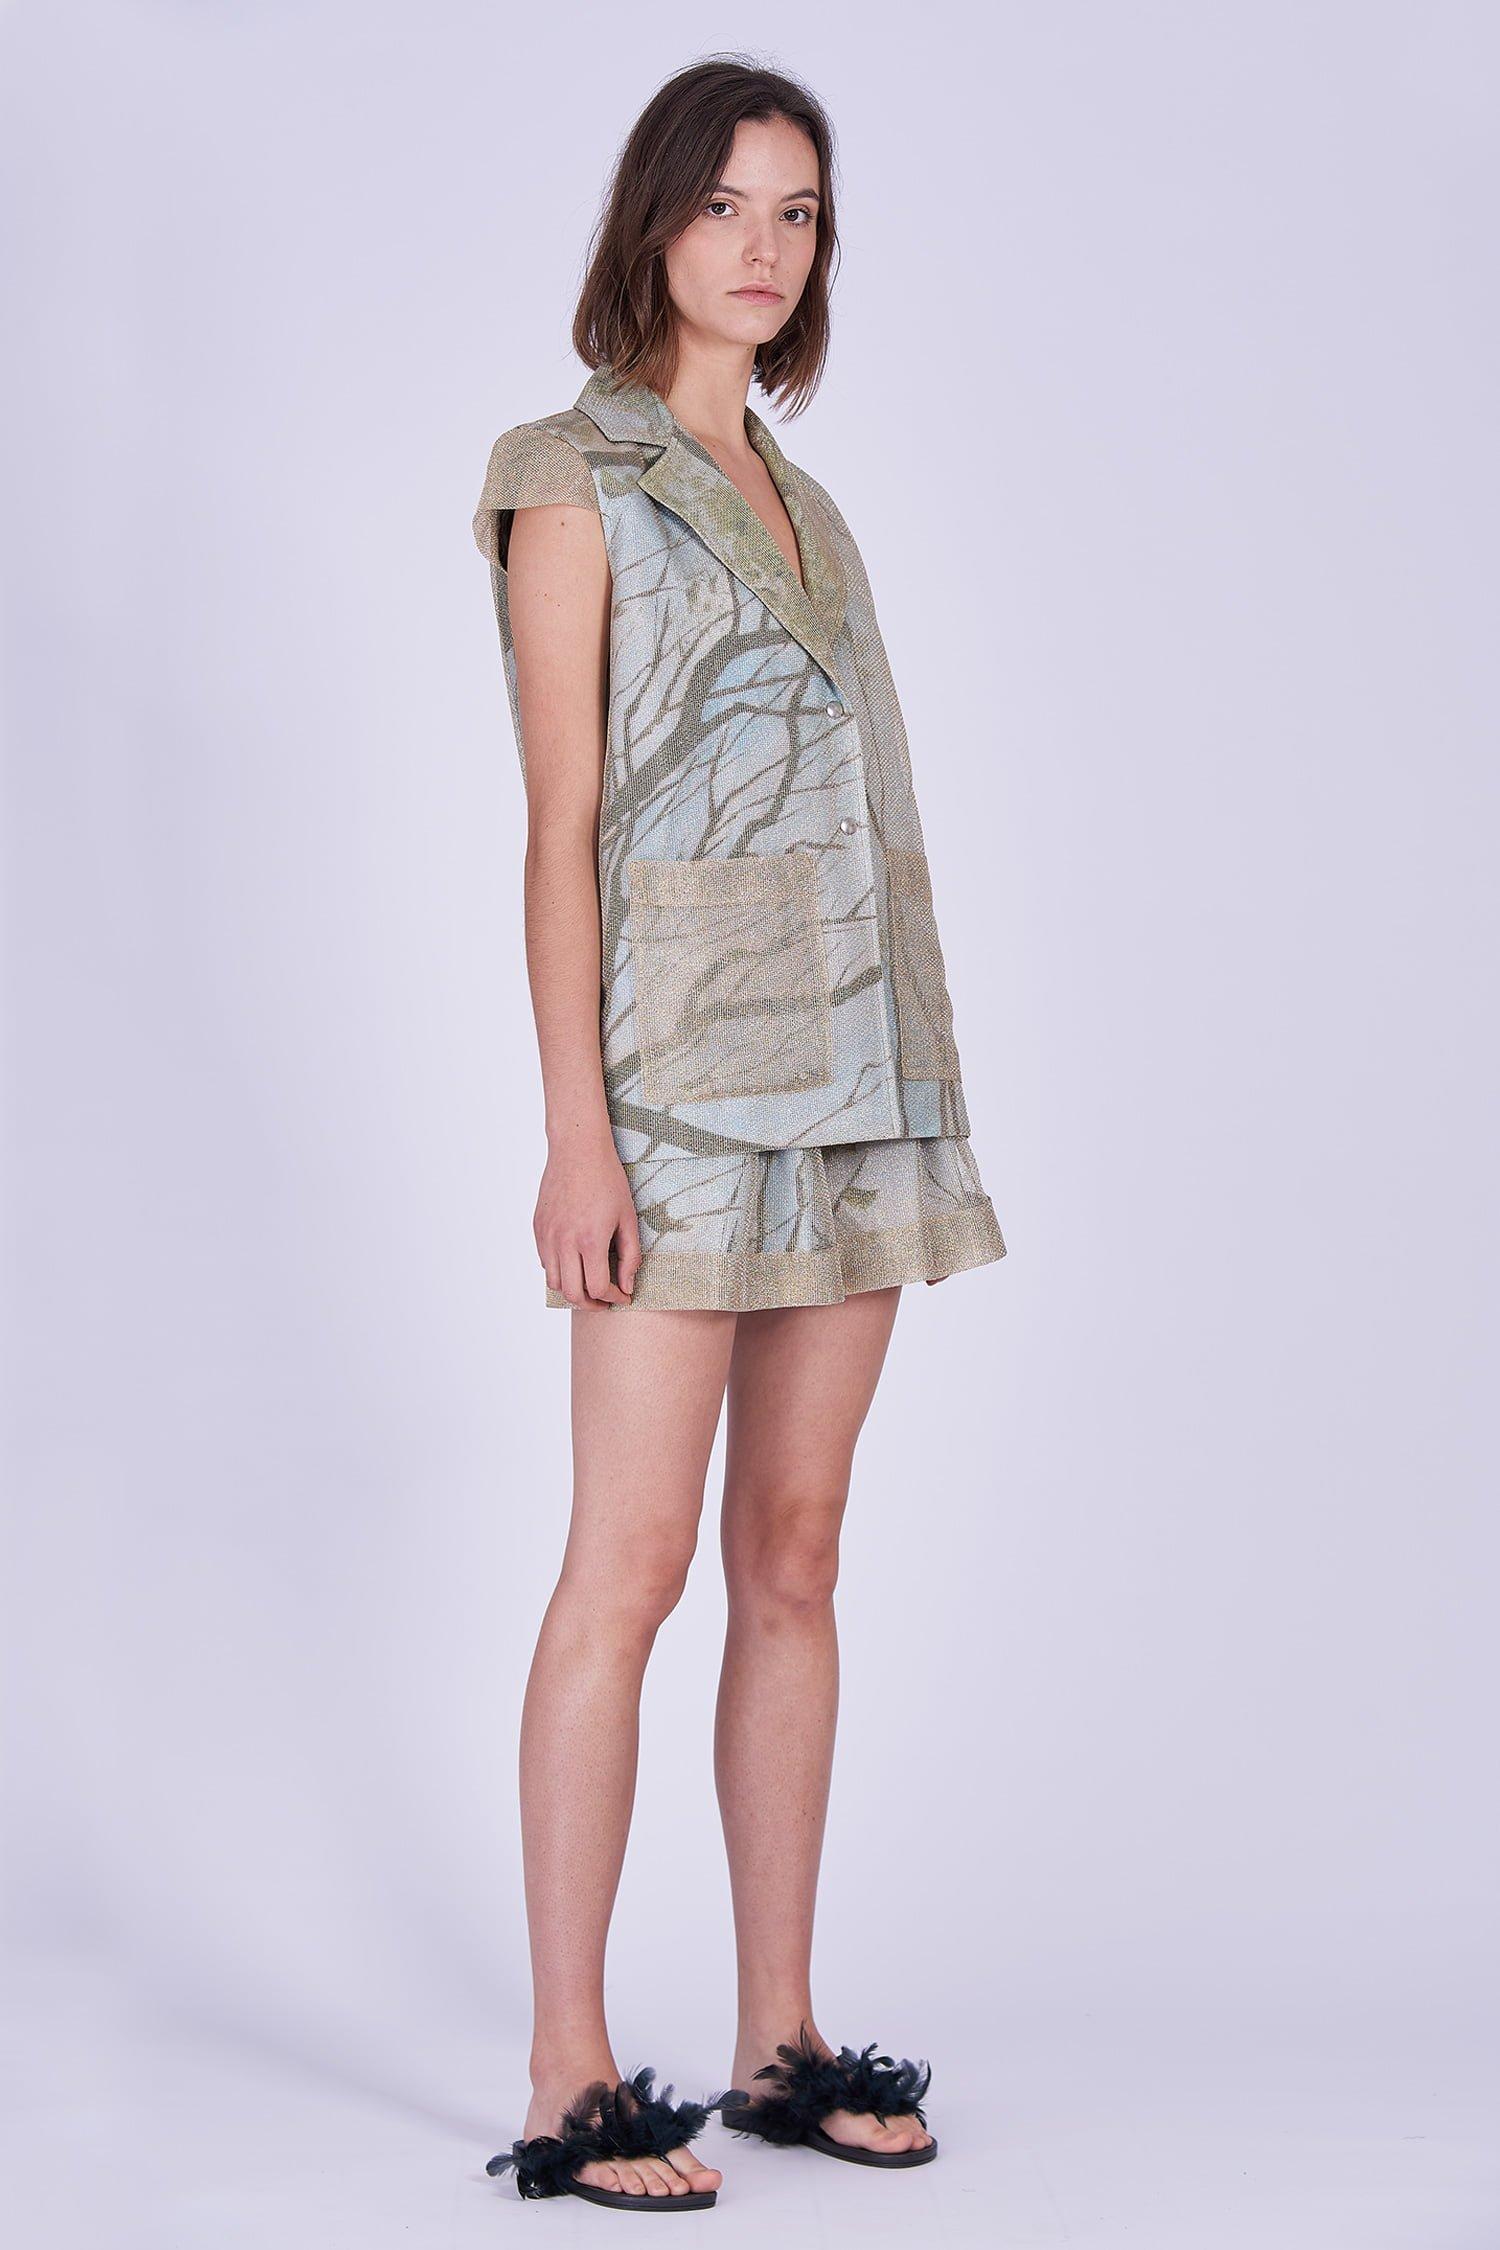 Acephala Ss2020 Gold Jacket Print Shorts Zlota Marynarka Szorty Front Side 2